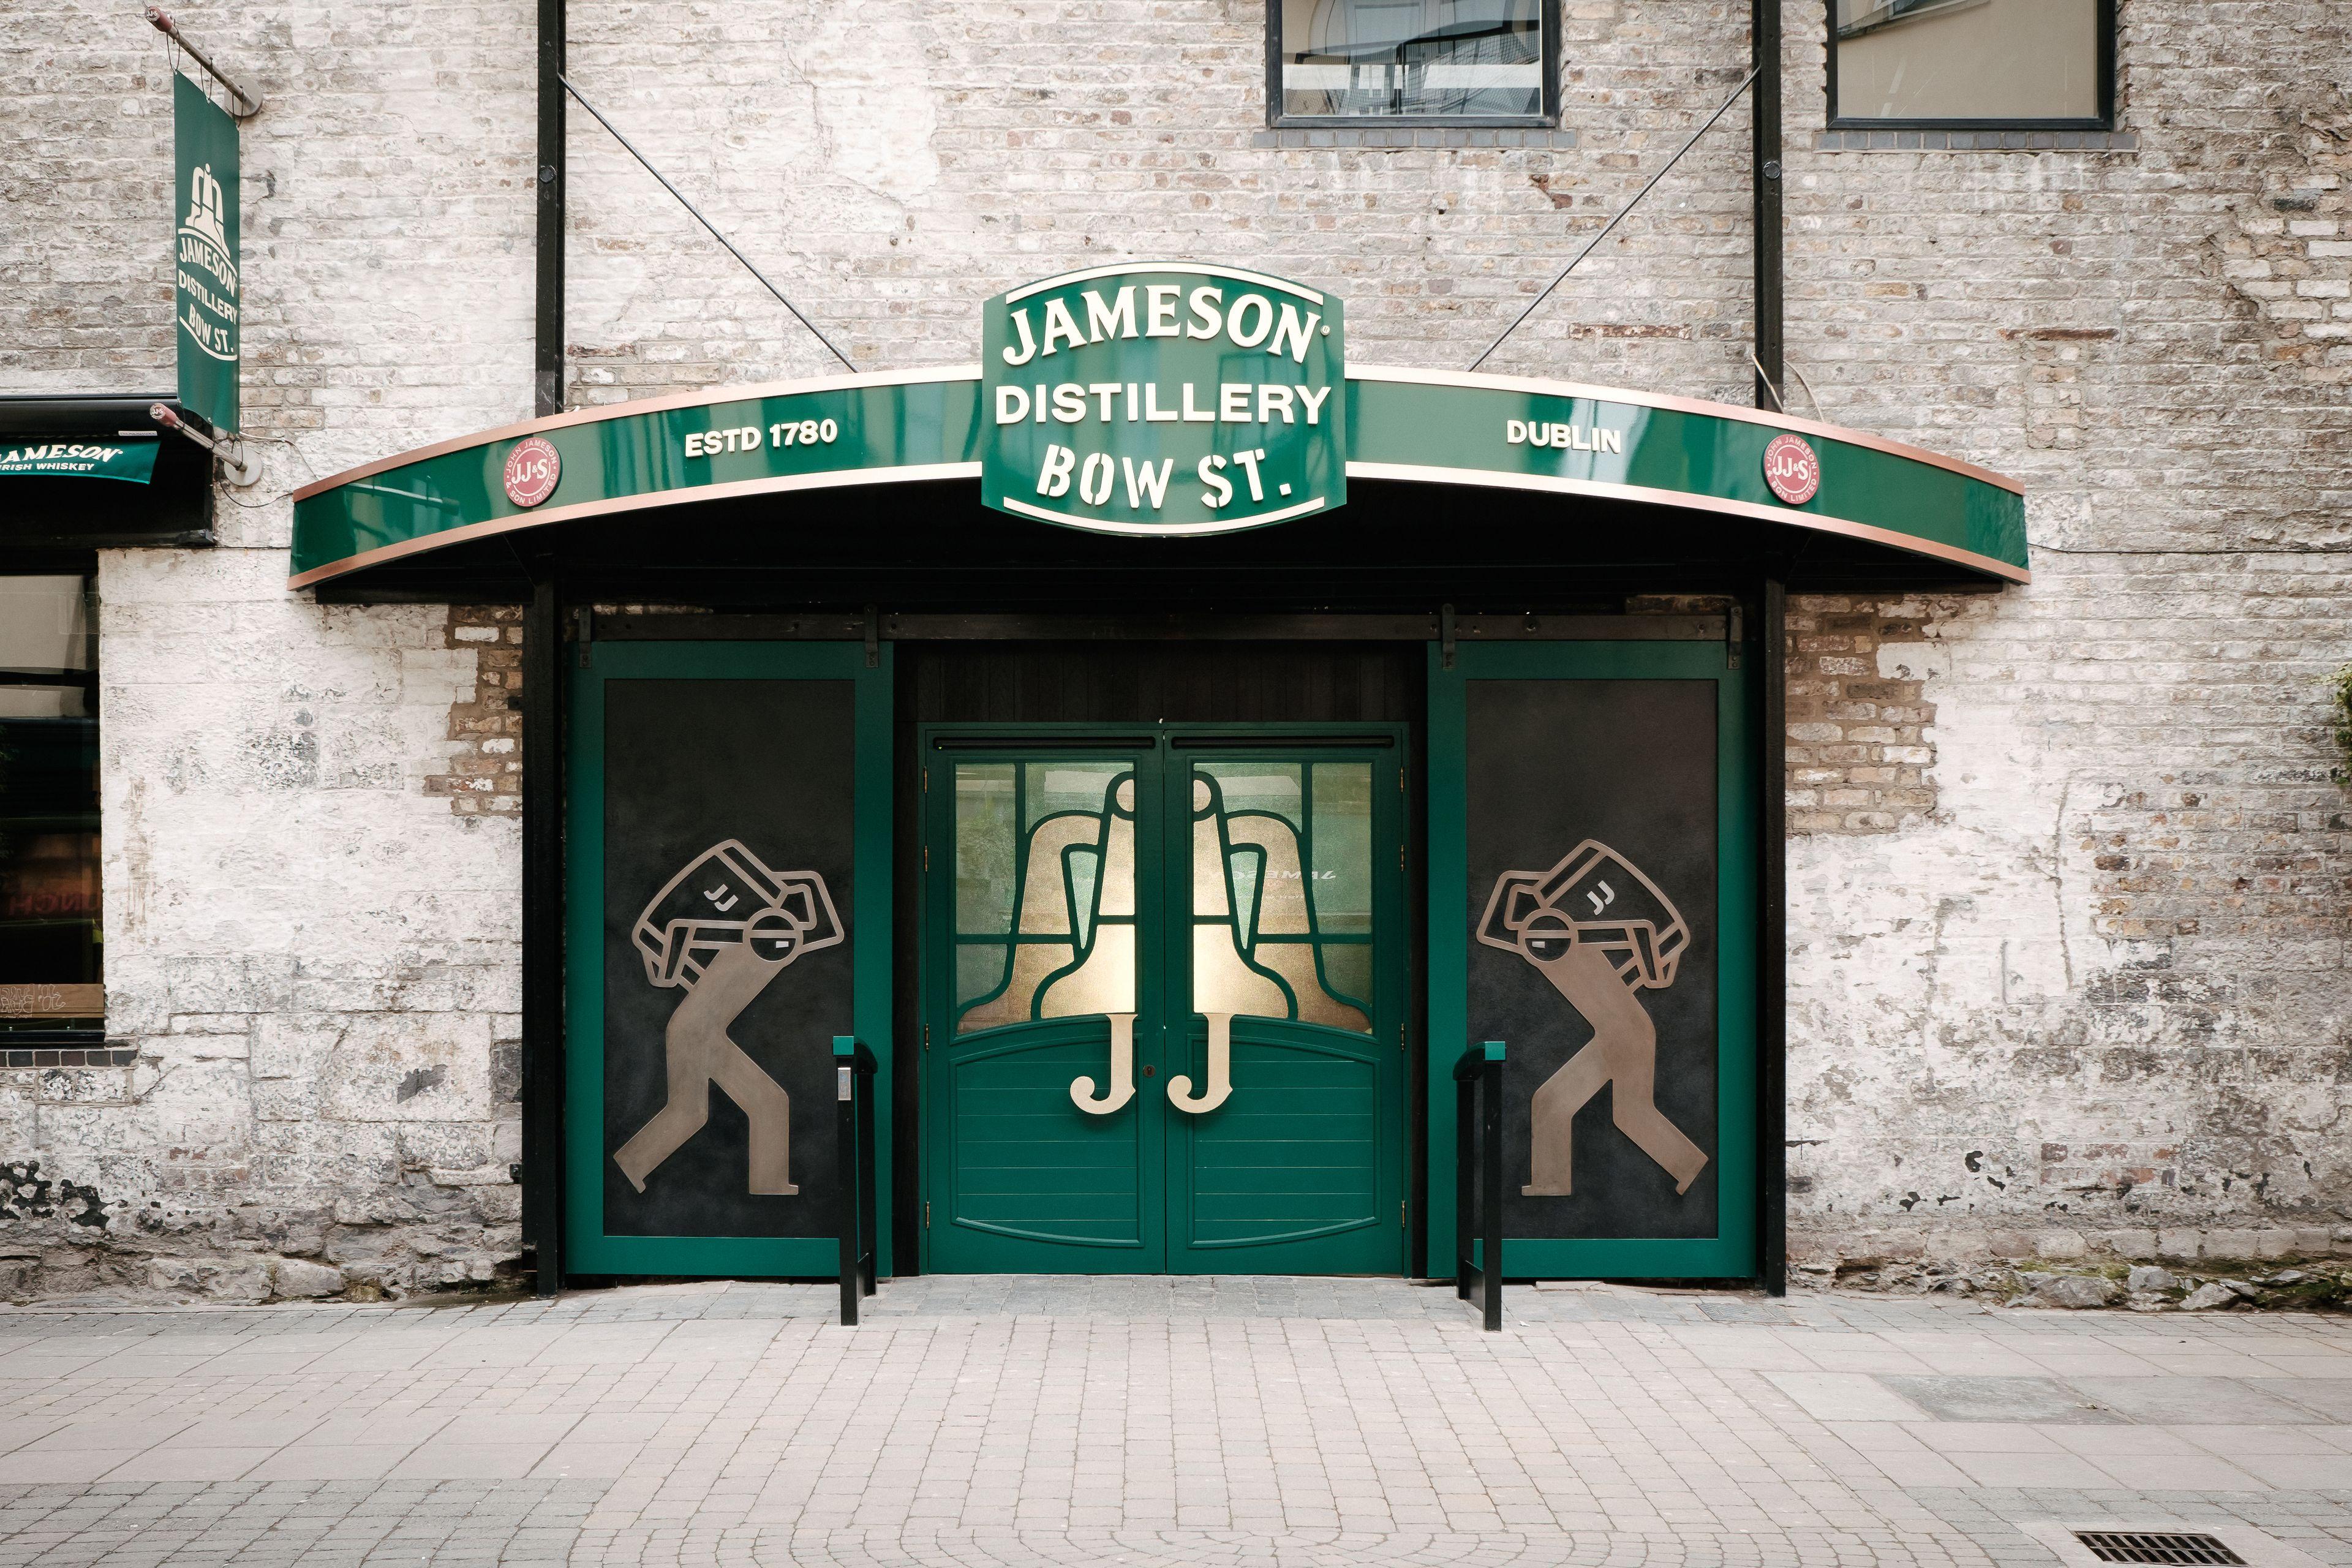 Tur på Jameson Distillery Bow St